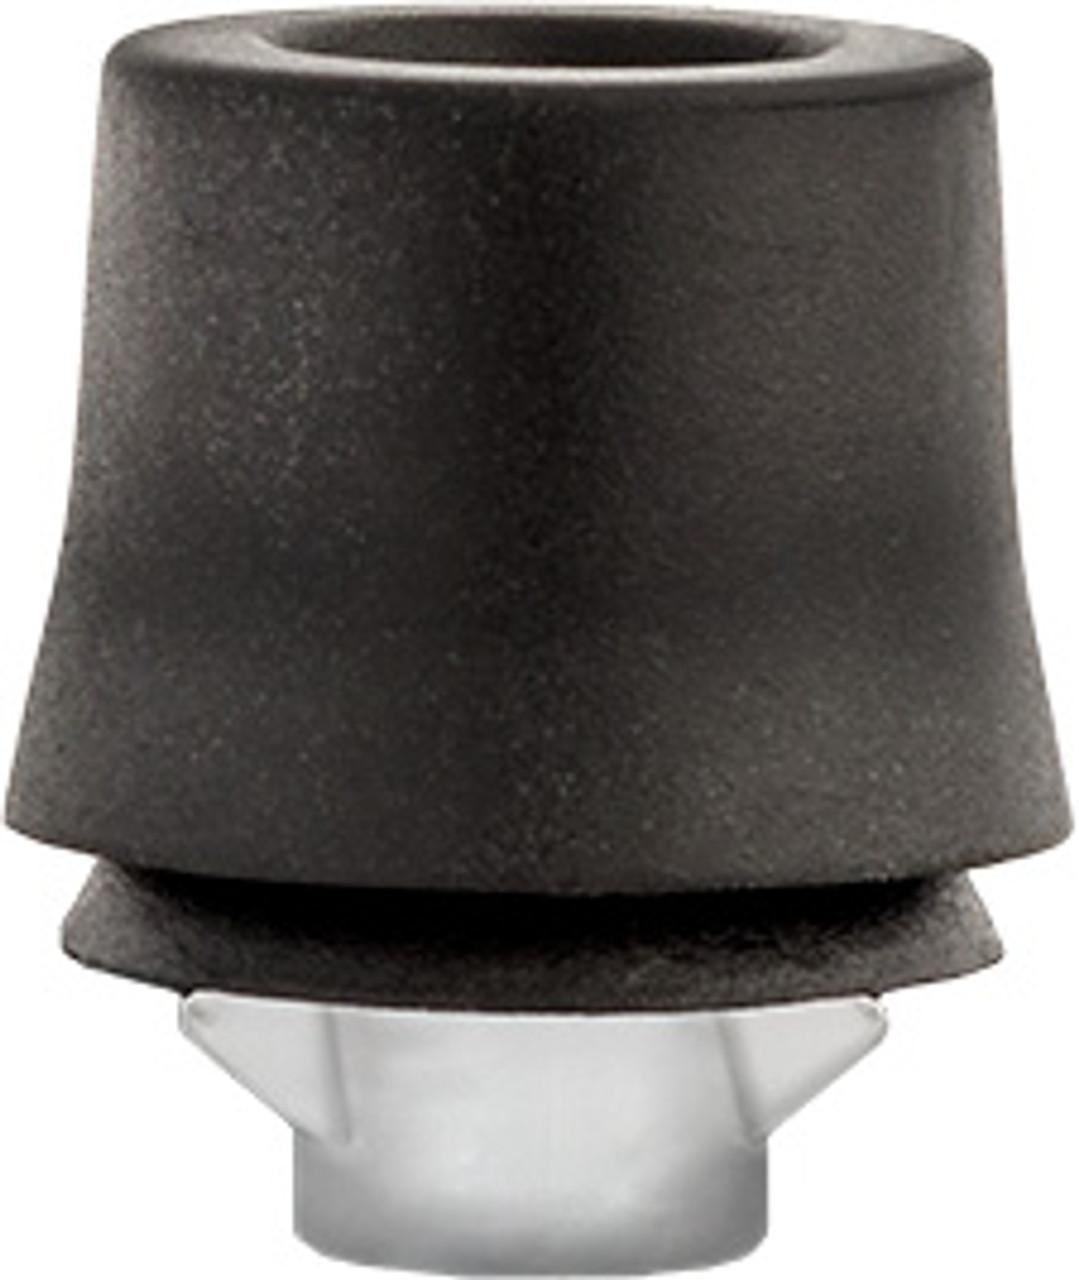 Front Door Rubber Bumper Rubber Diameter at Top: 15mm Rubber Diameter at Bottom: 17mm Rubber & Nylon Overall Height: 19.5mm Toyota 4Runner, Corolla, Highlander, Land Cruiser, Matrix, RAV4 & Tercel 1999 - On Toyota OEM# 90541-09069 25 Per Box